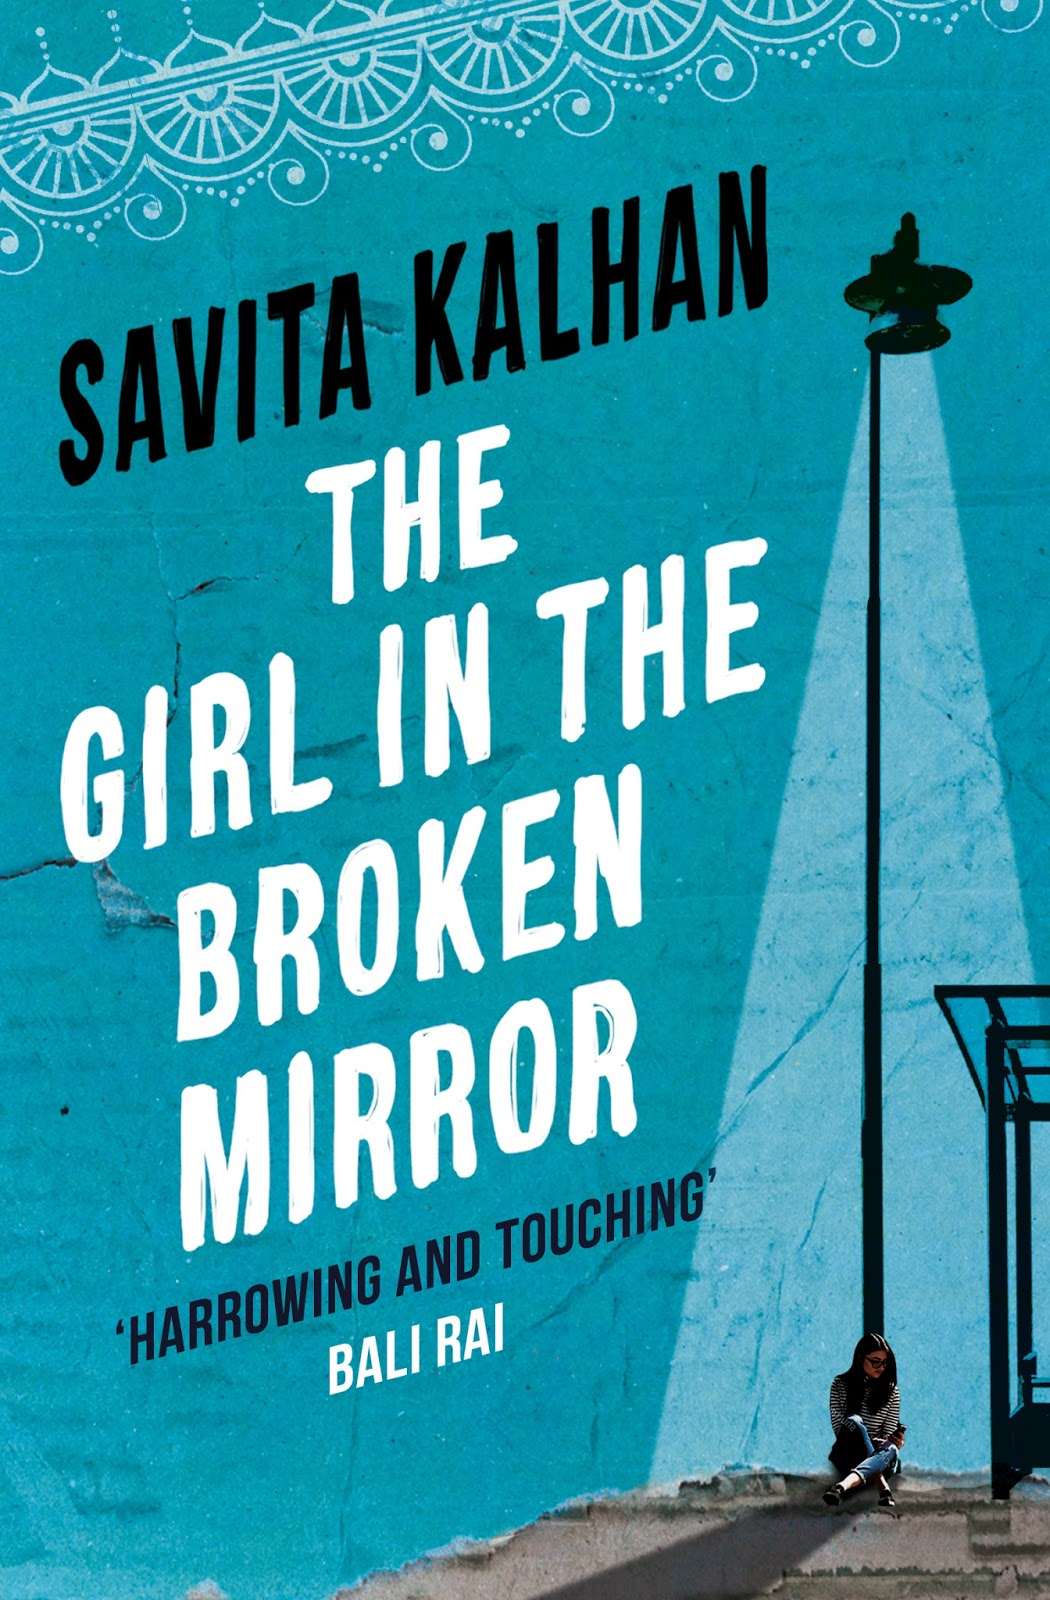 The Girl in the Broken Mirror by Savita Kalhan